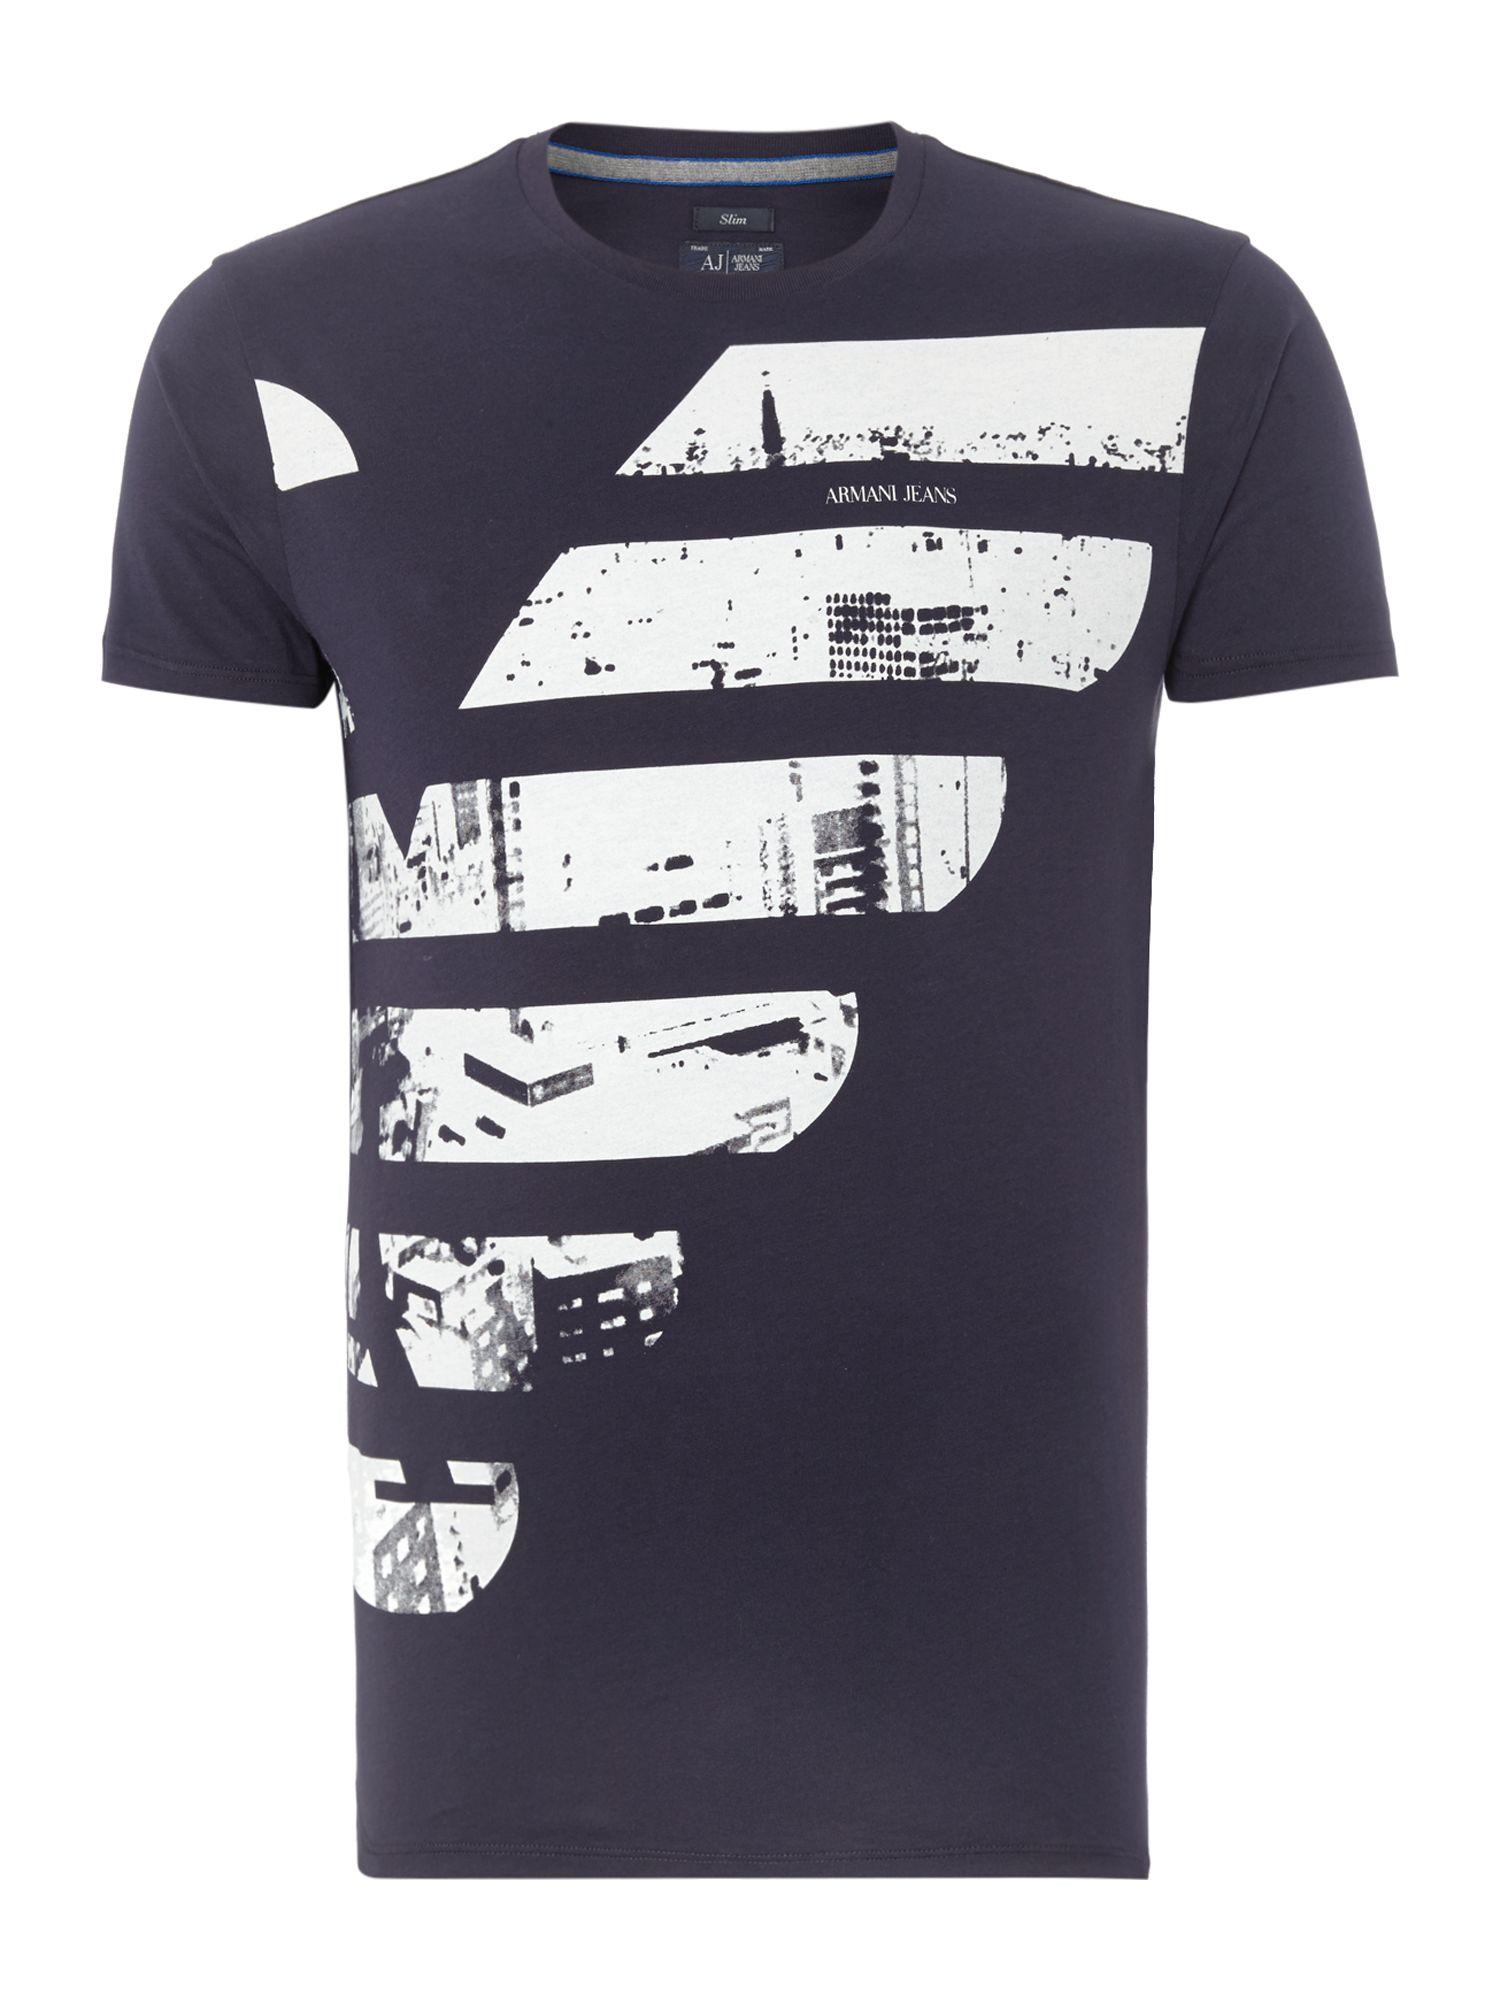 T Nike Shirts Best Men